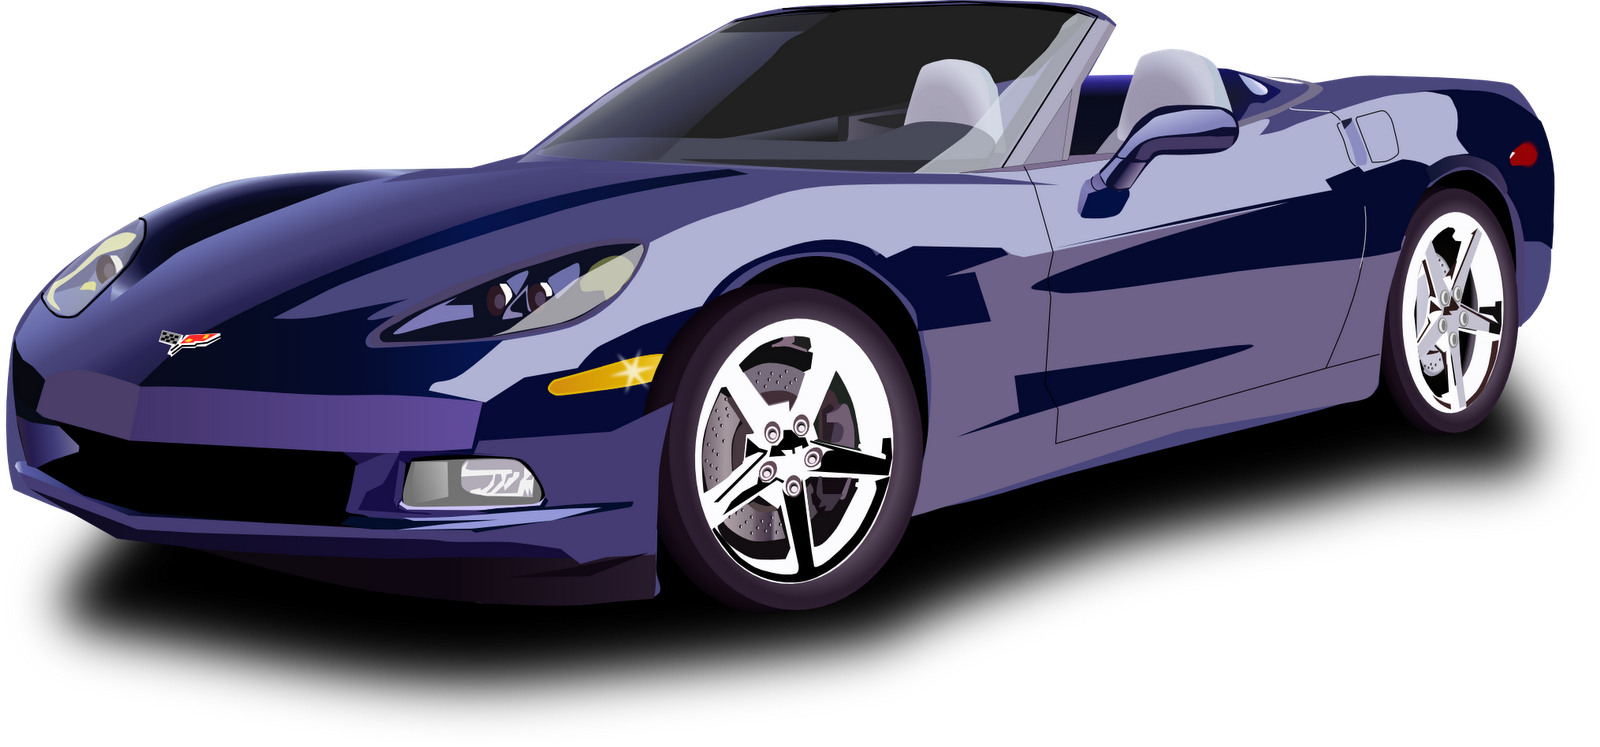 Ferarri clipart modern car Cliparts Car Inspiration In Clipart